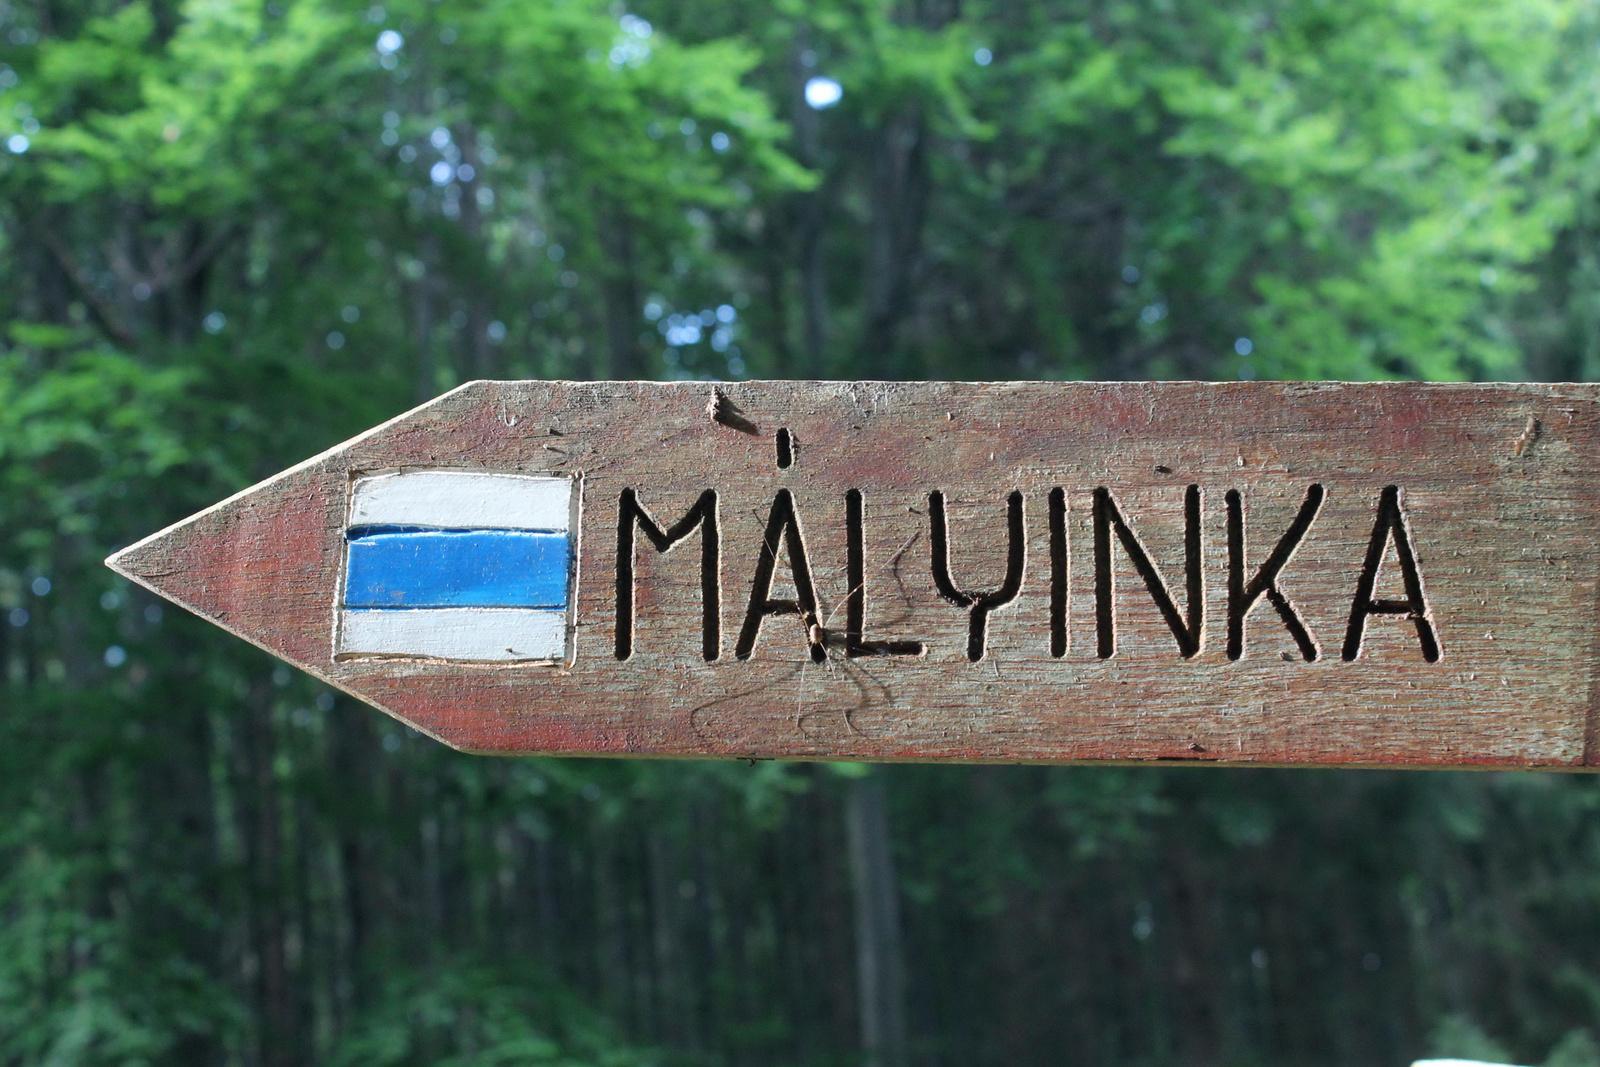 20180728-10-Malyinka